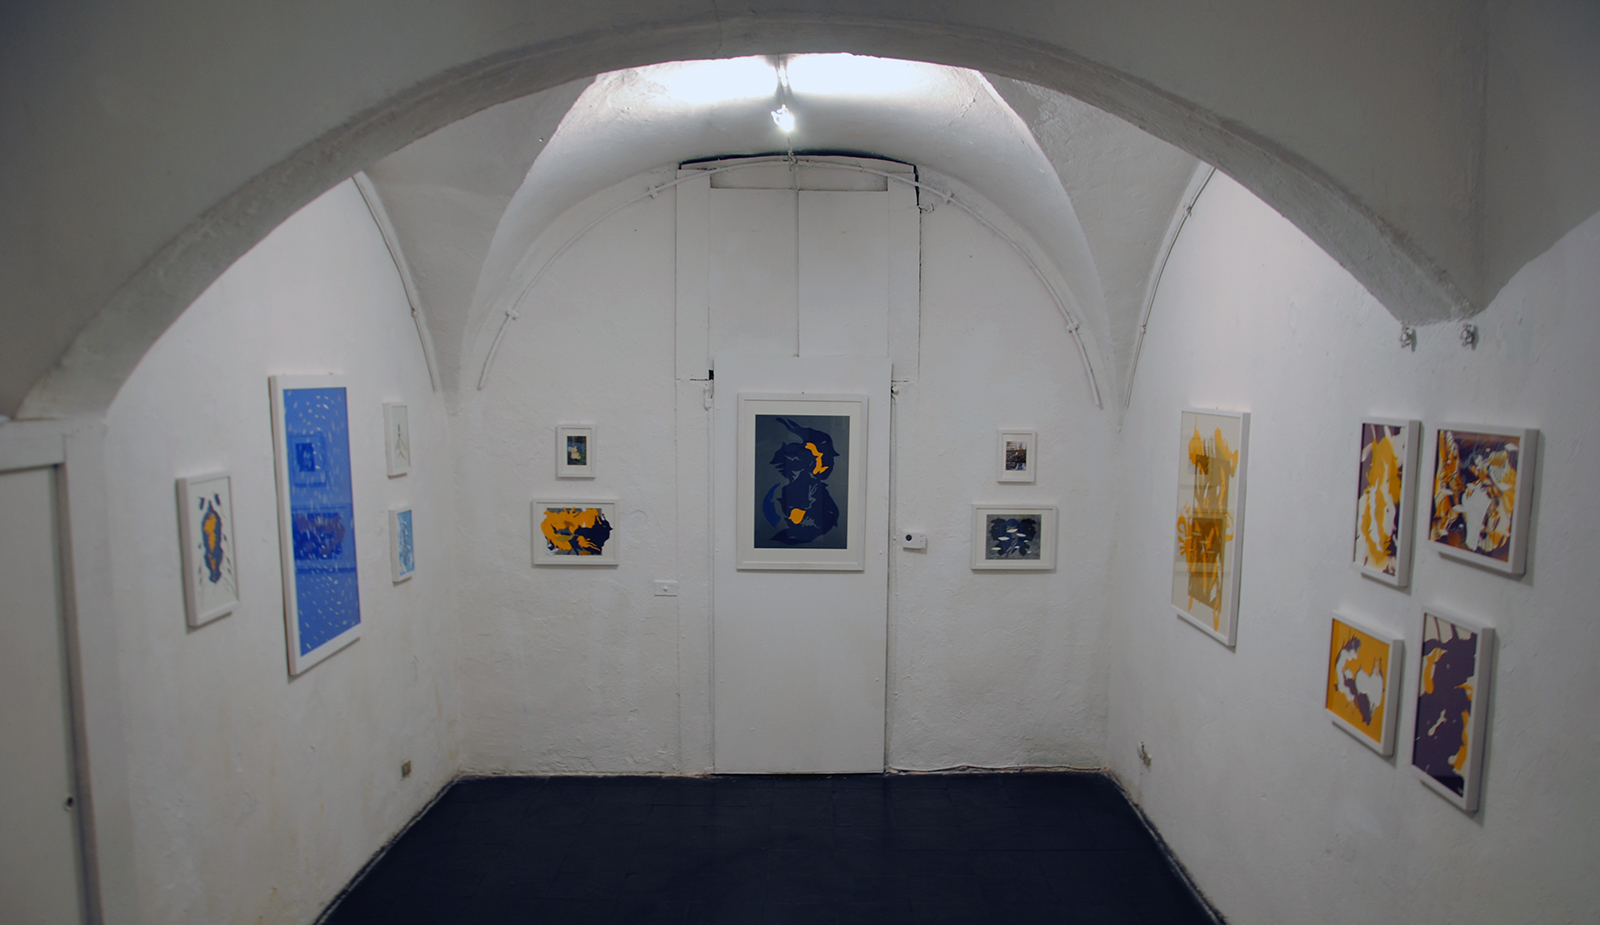 aris-la-macchia-umana-at-studio-dars-recap-10